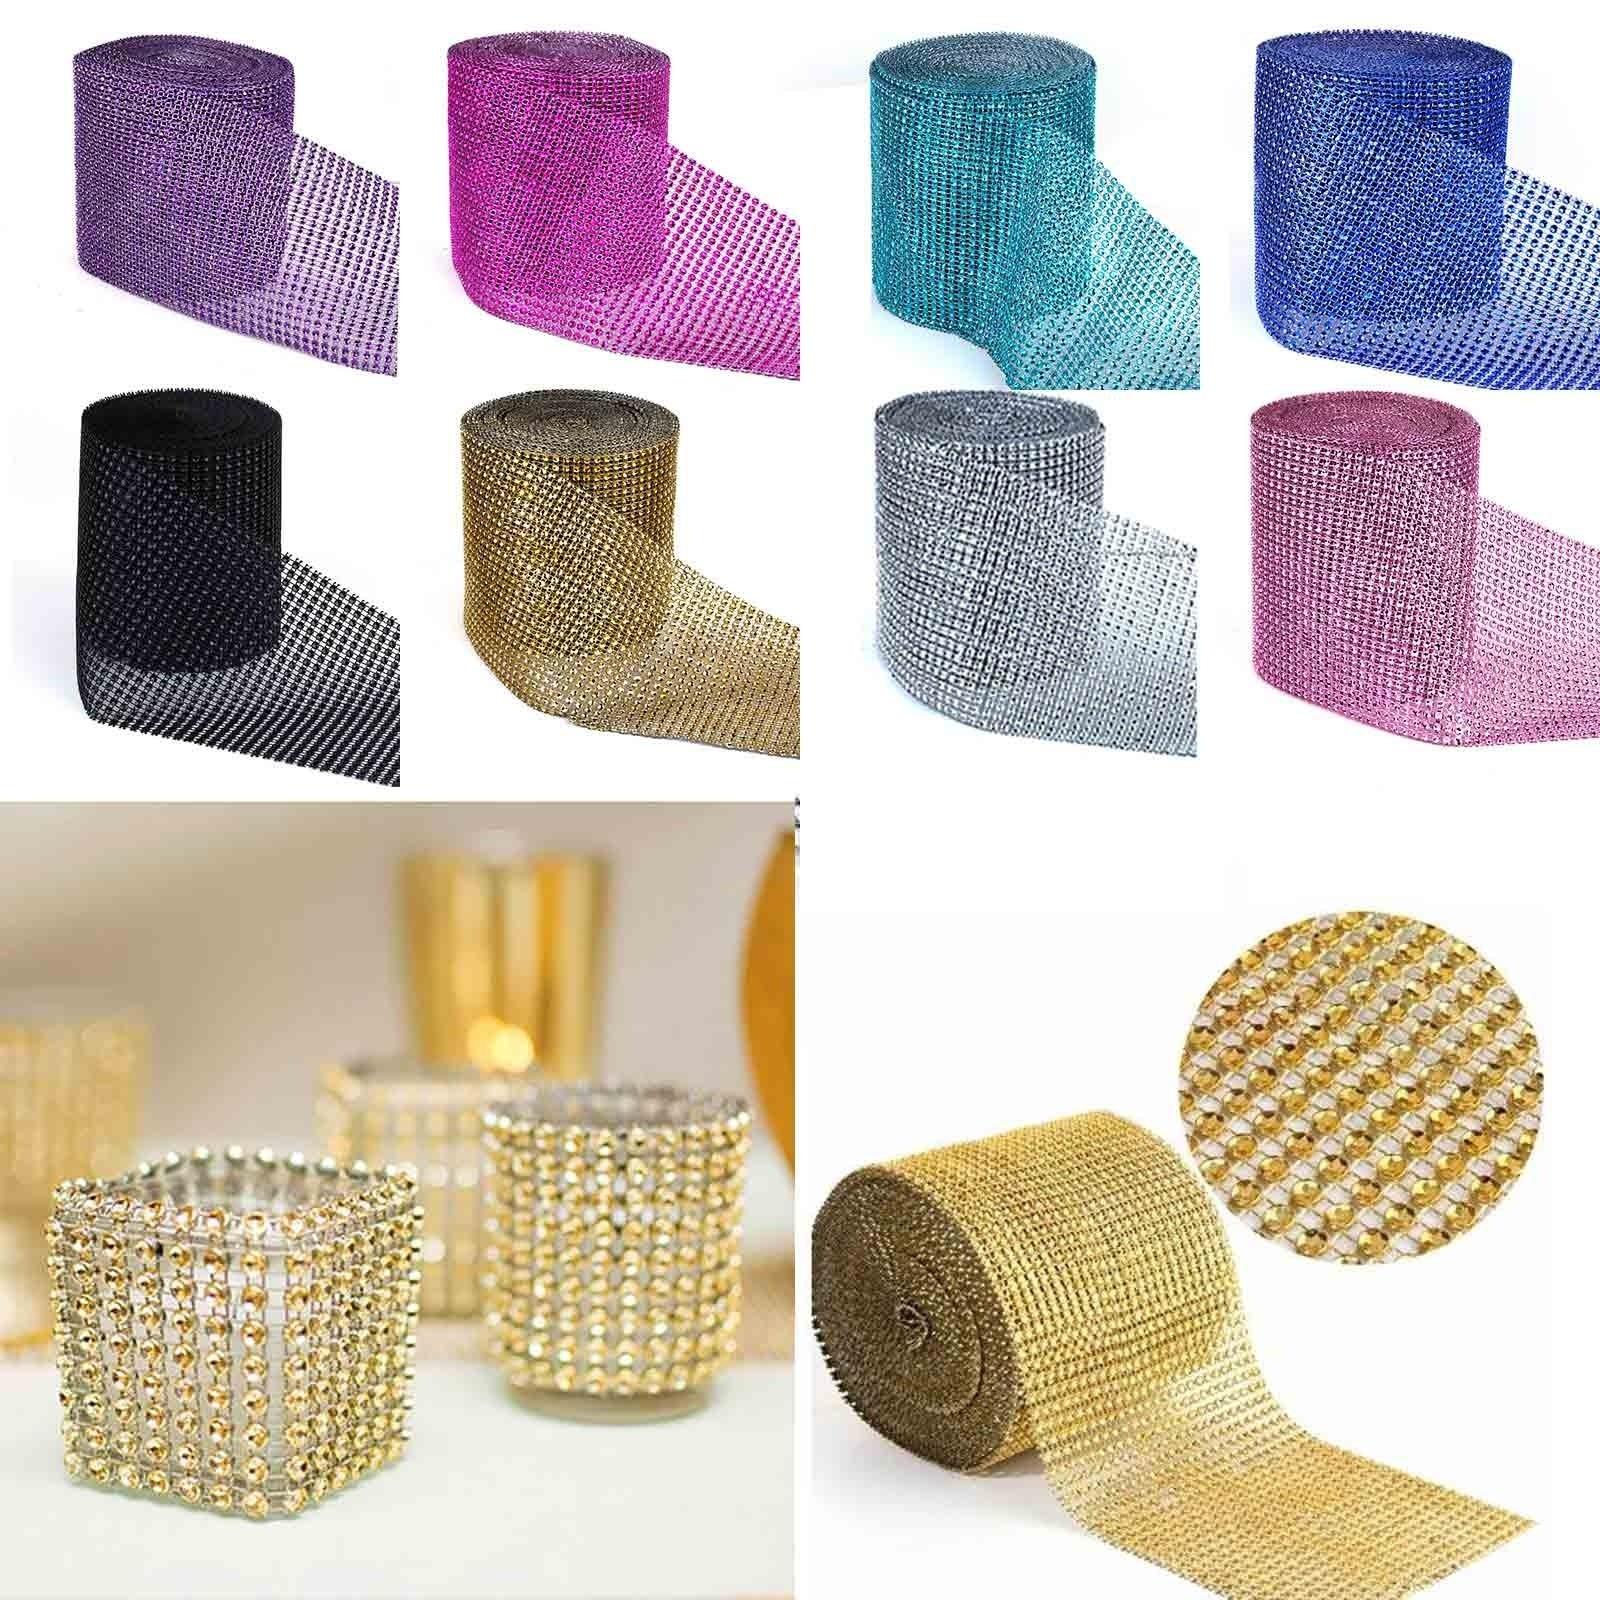 915cm fashion rhinestone chain diamond mesh trim wedding 1yard915cm 24 row fashion mesh trim bling wrap cake roll tulle crystal ribbons junglespirit Gallery